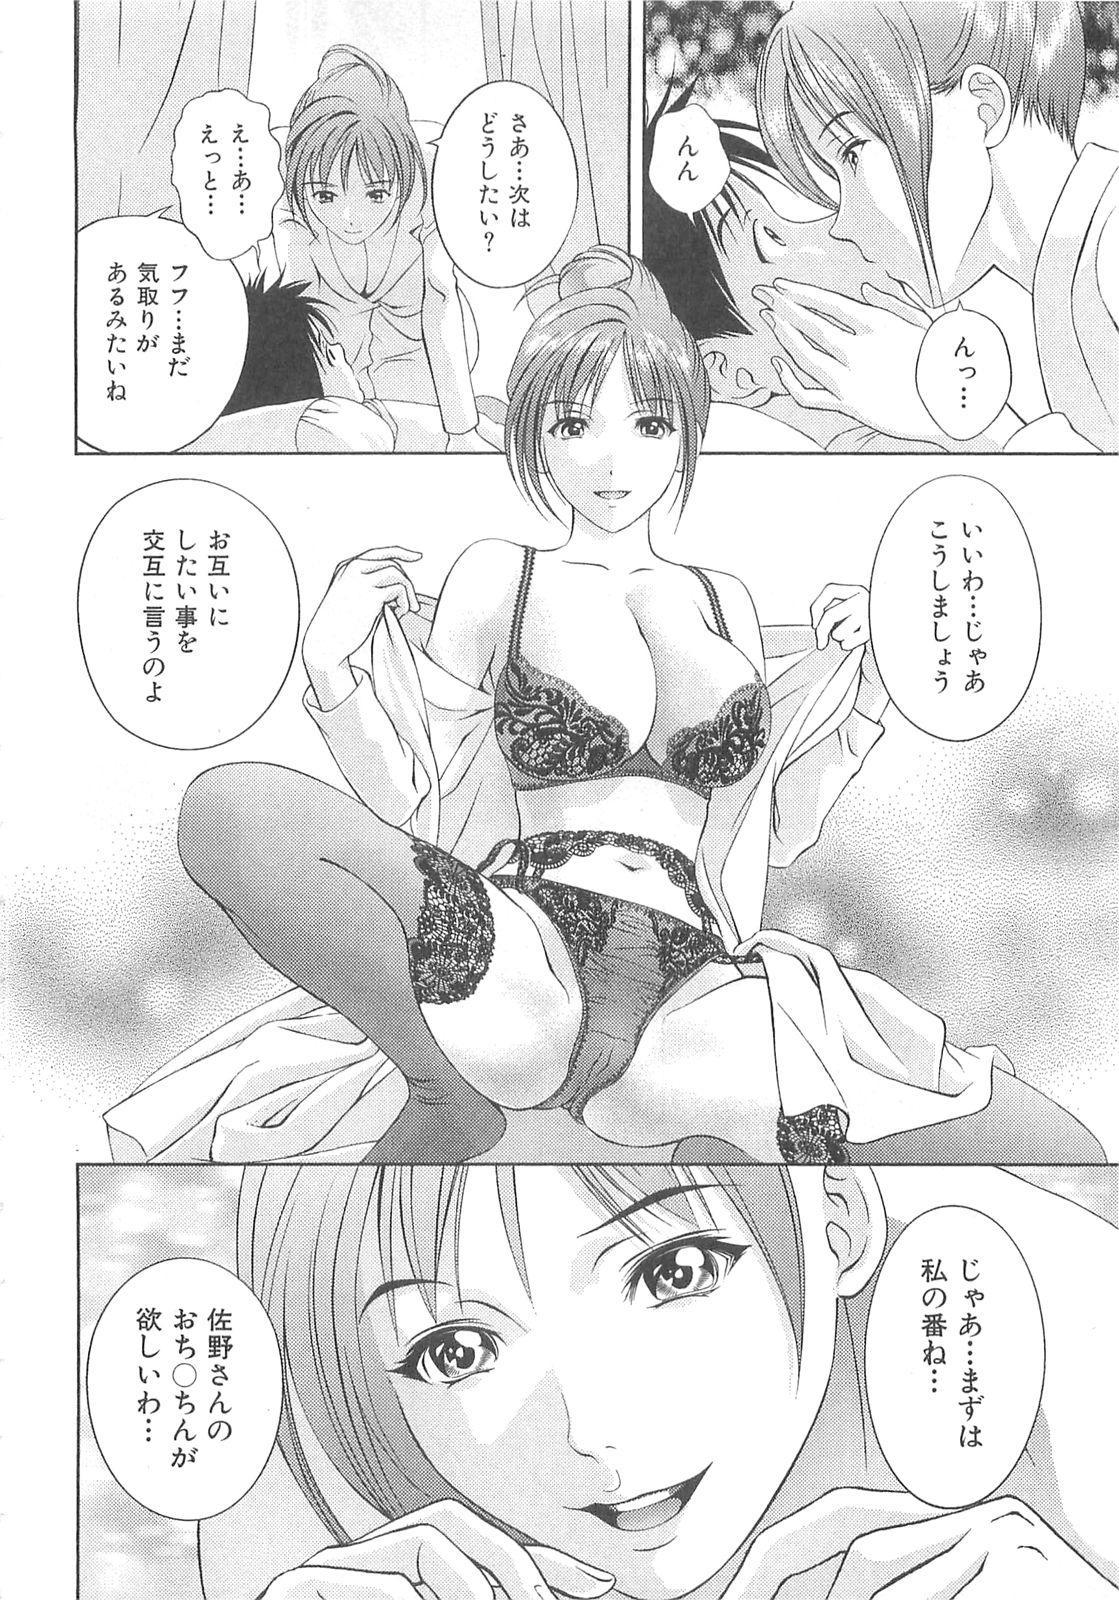 Tenshi no Kyuu - Angel's Pretty Hip 132